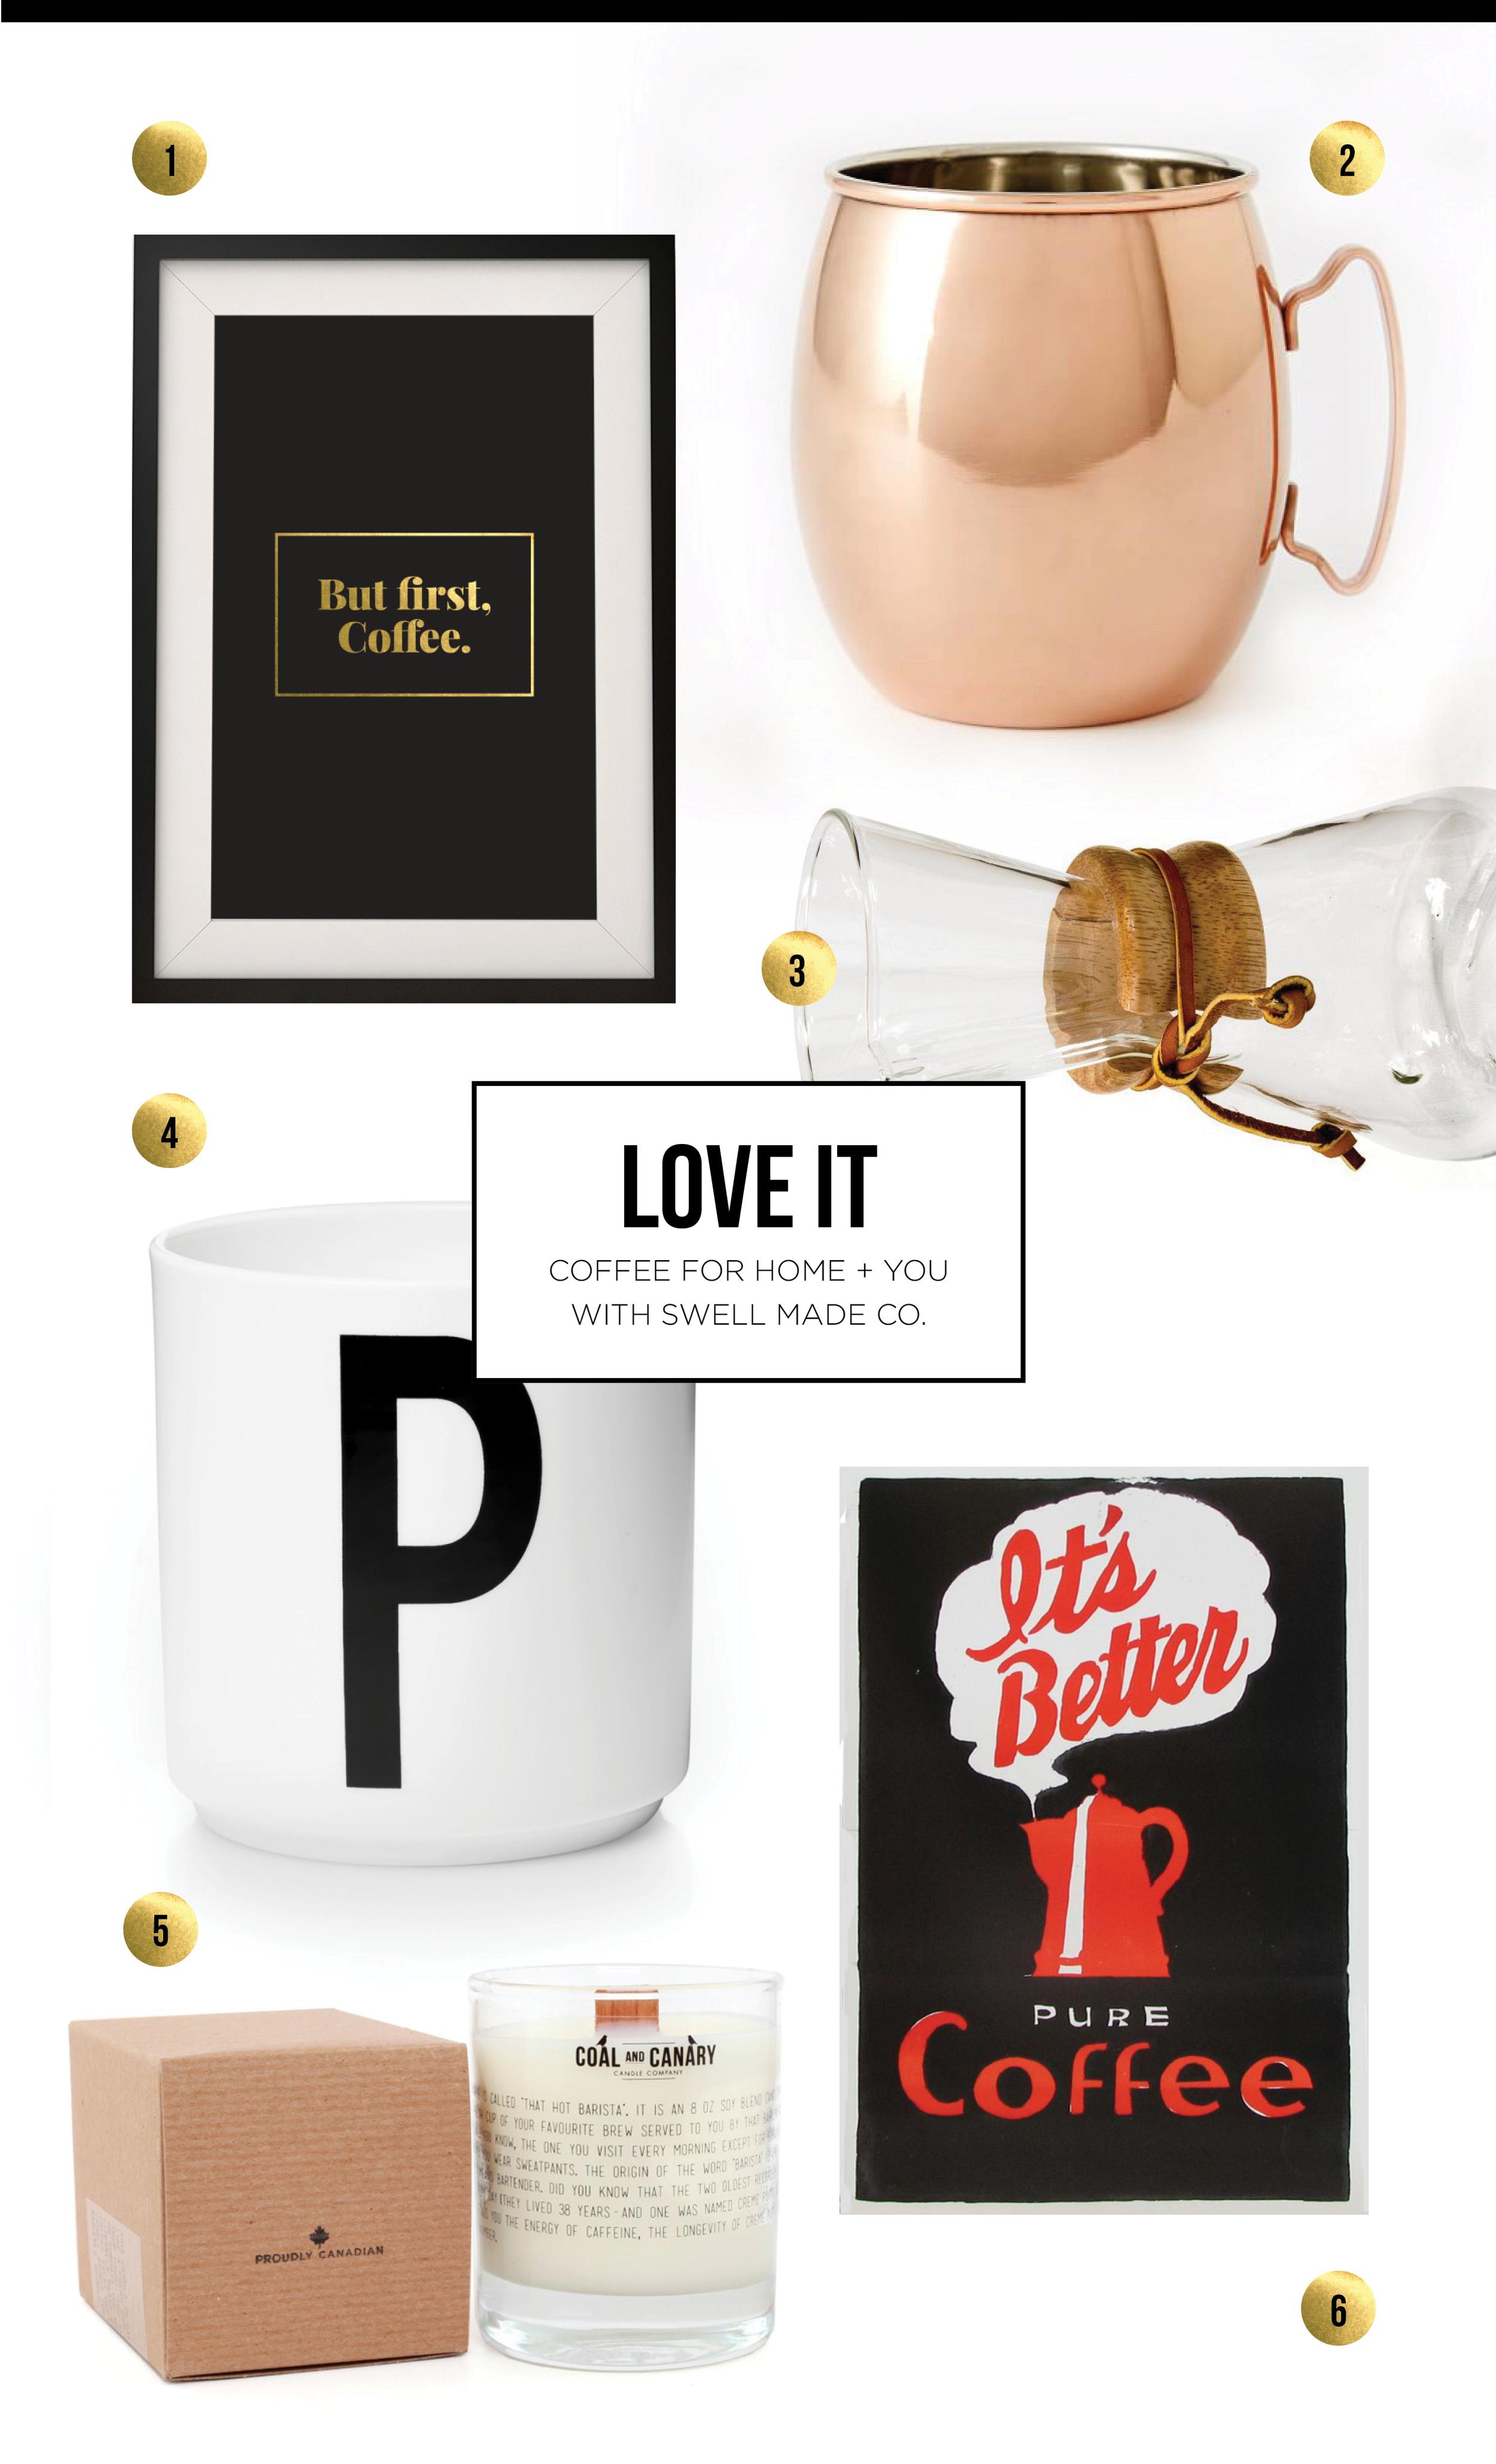 swellmadeco-loveit-coffee.jpg